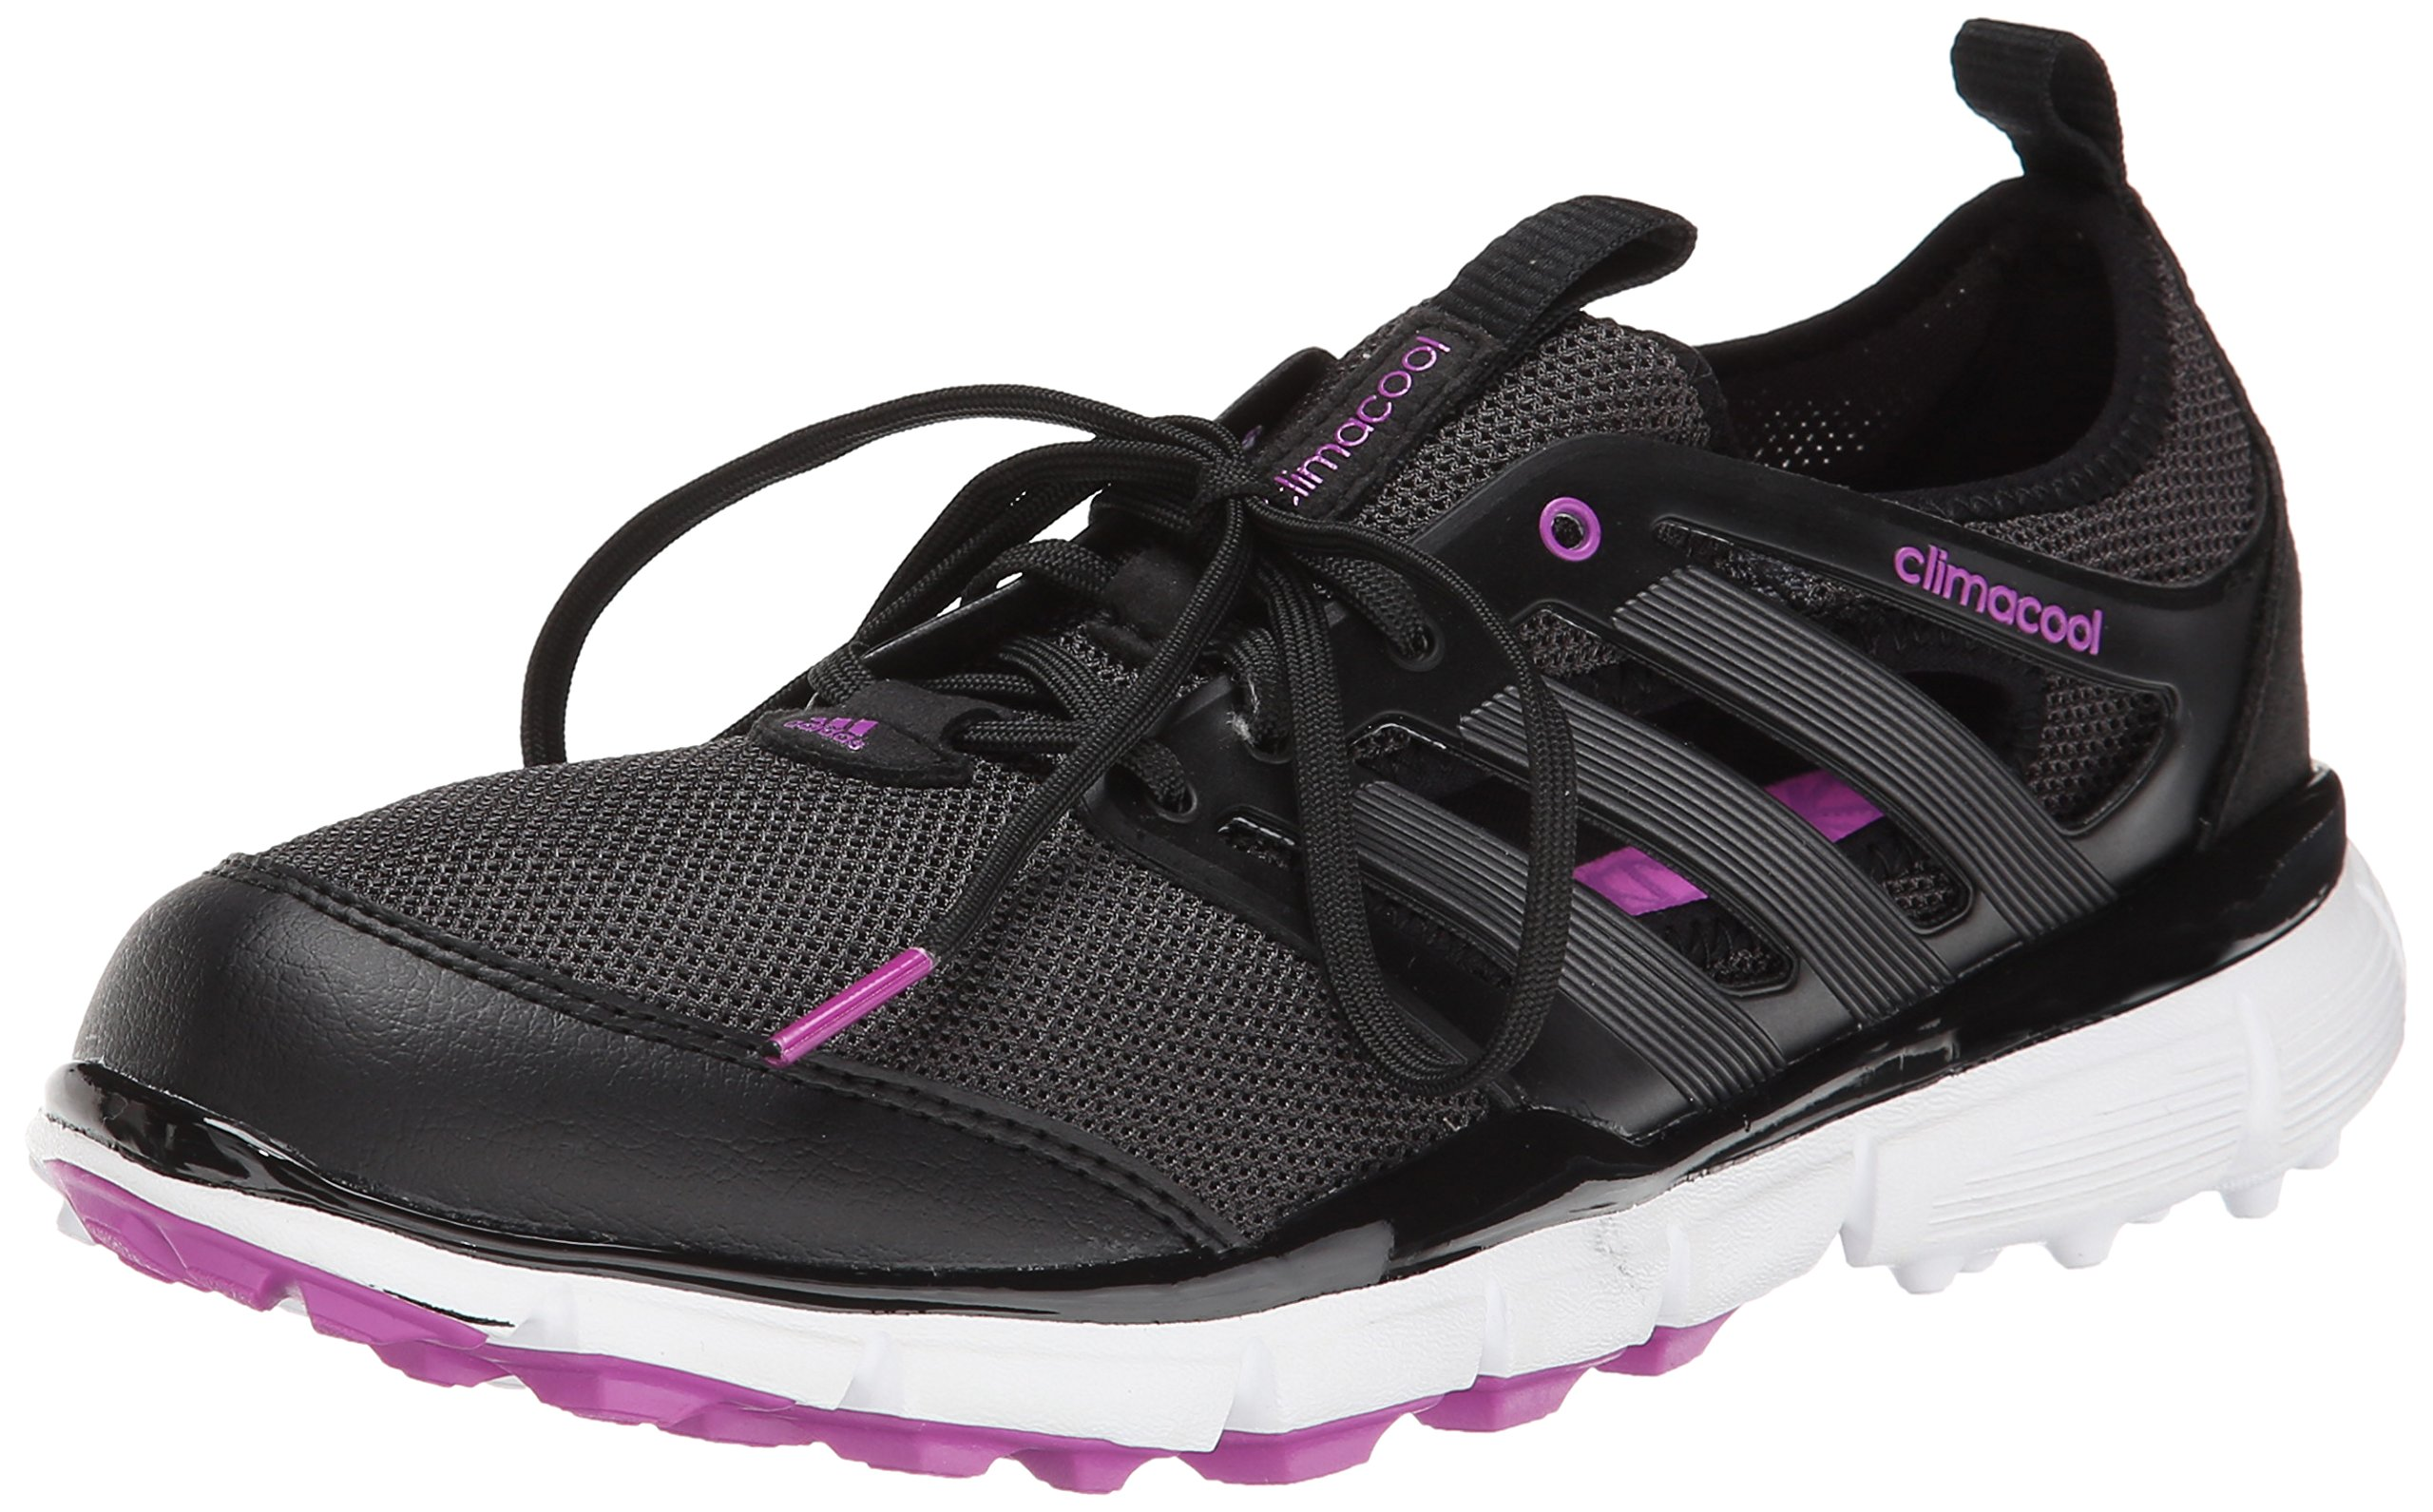 adidas Women's W Climacool II Golf Shoe, Core Black/Iron Metallic/Flash Pink, 8.5 M US